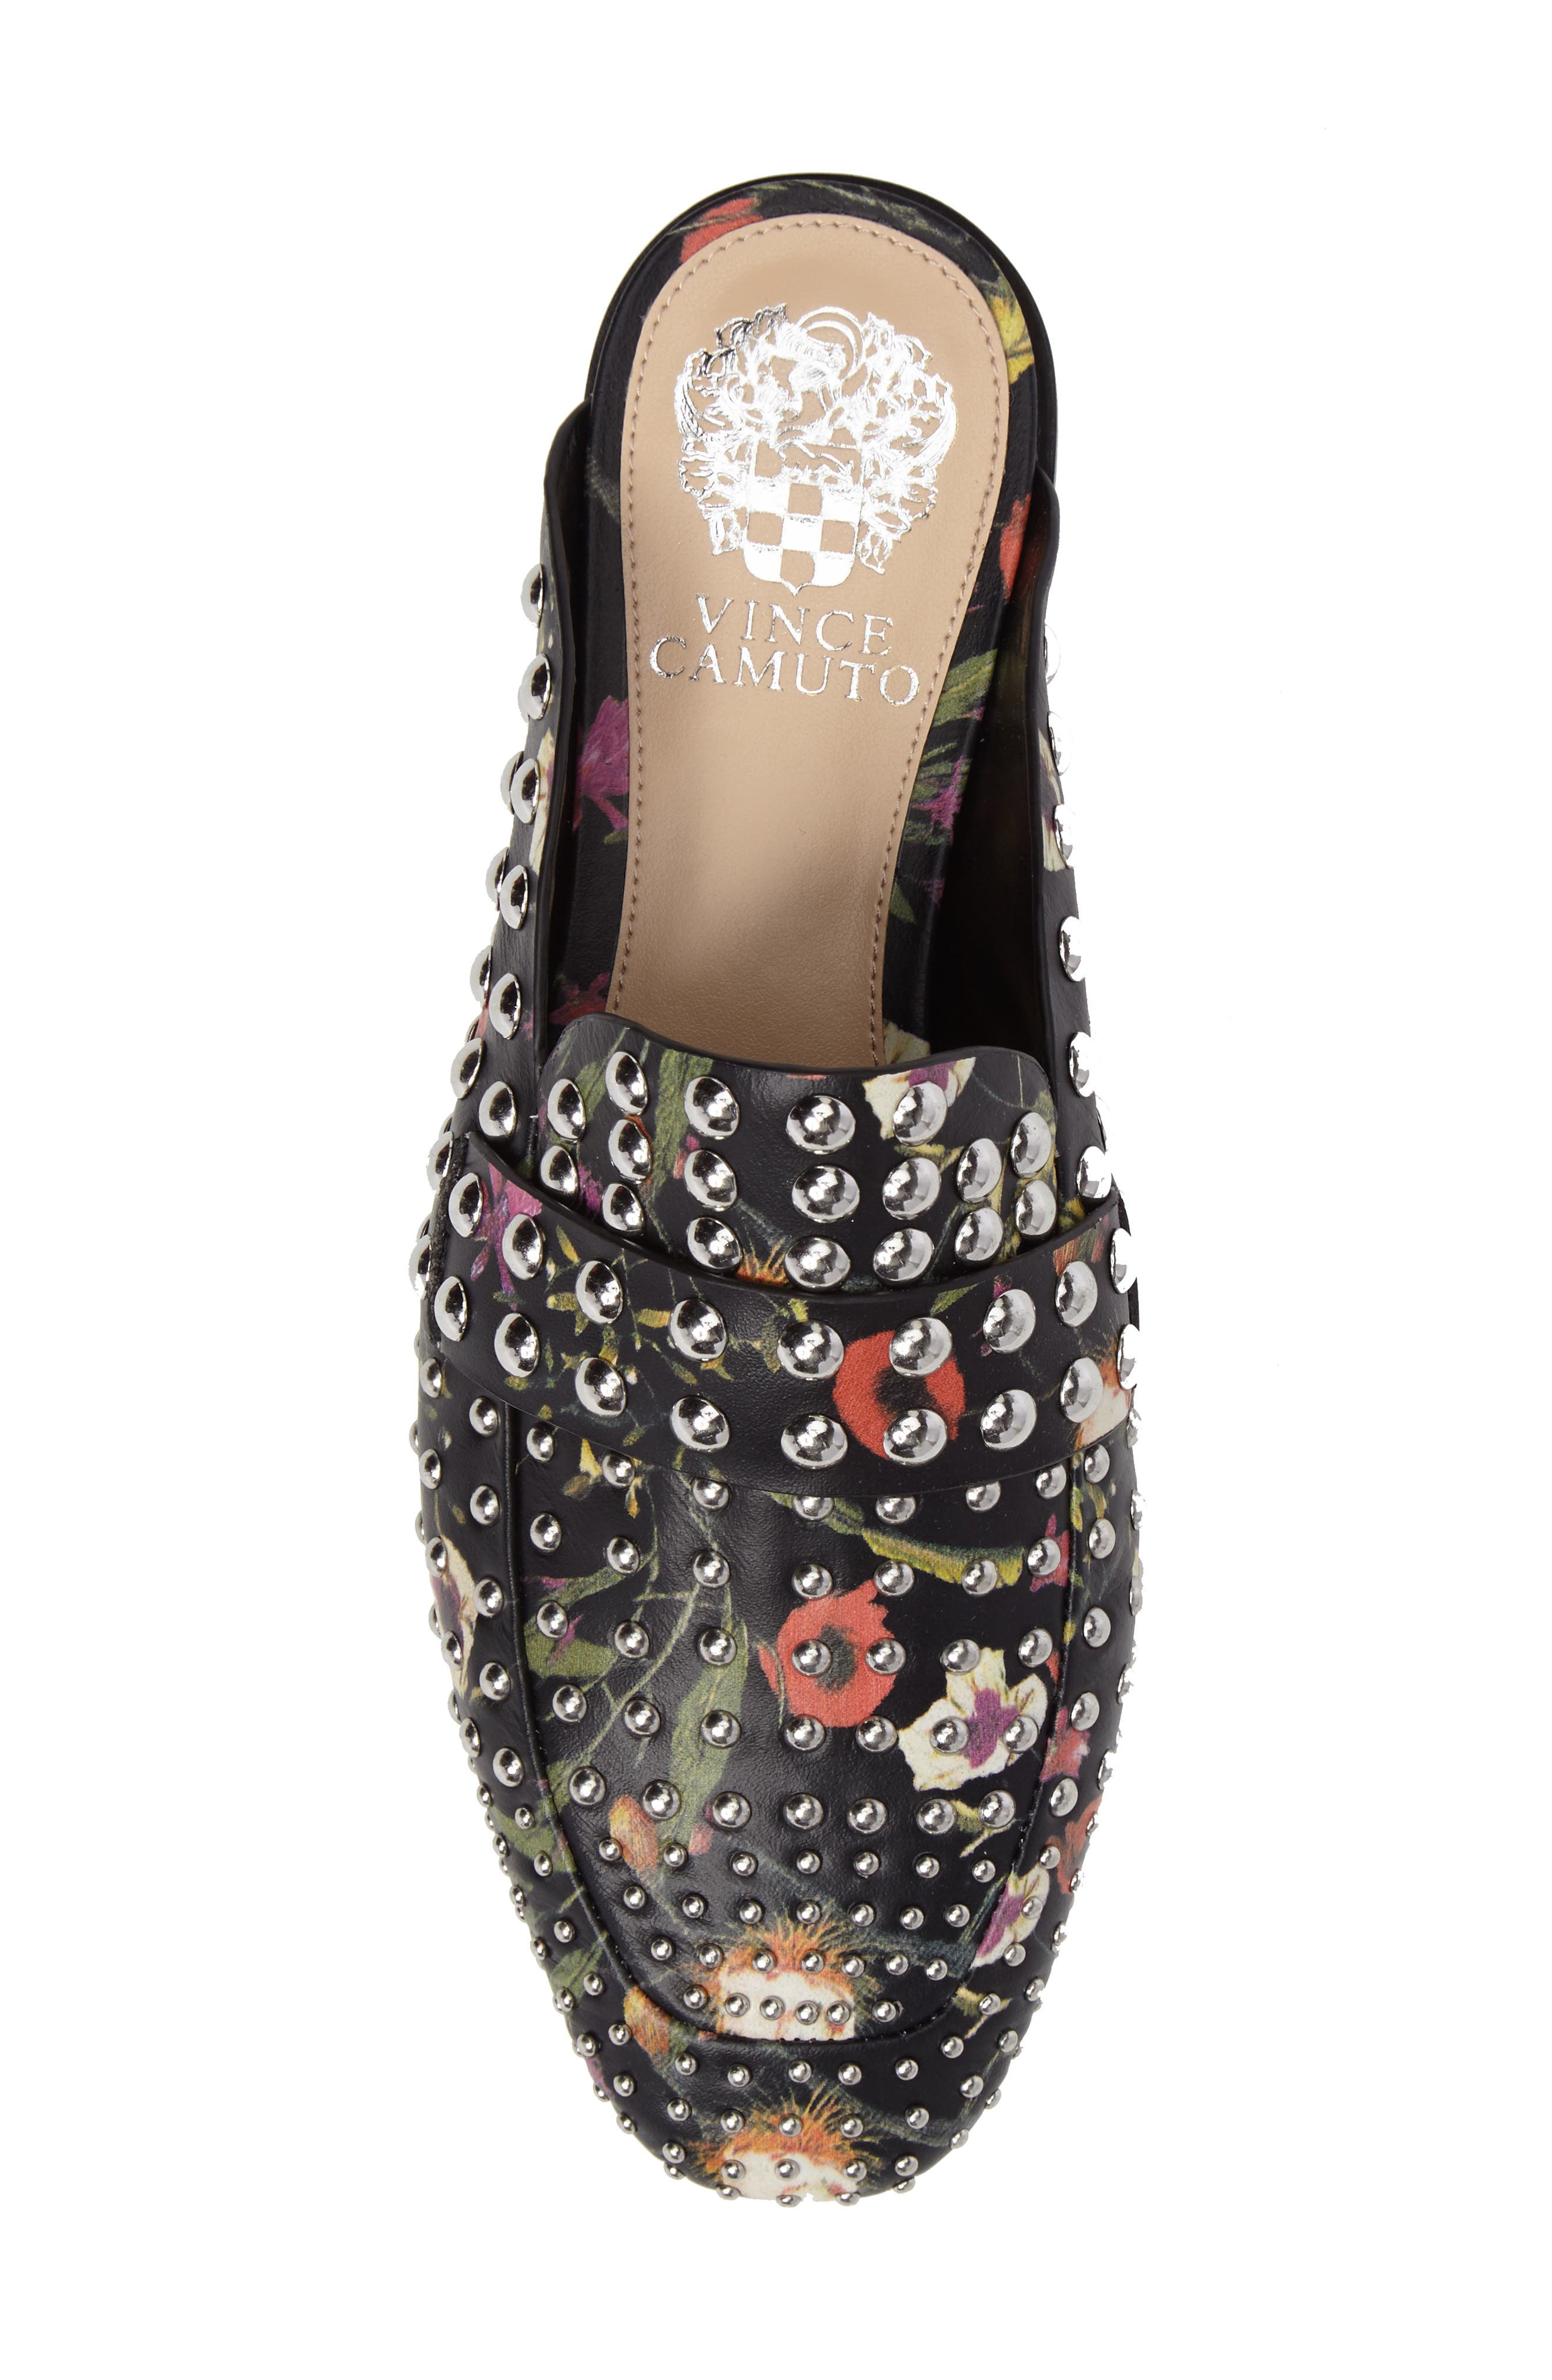 Sessa Studded Loafer Mule,                             Alternate thumbnail 6, color,                             Black Floral Leather